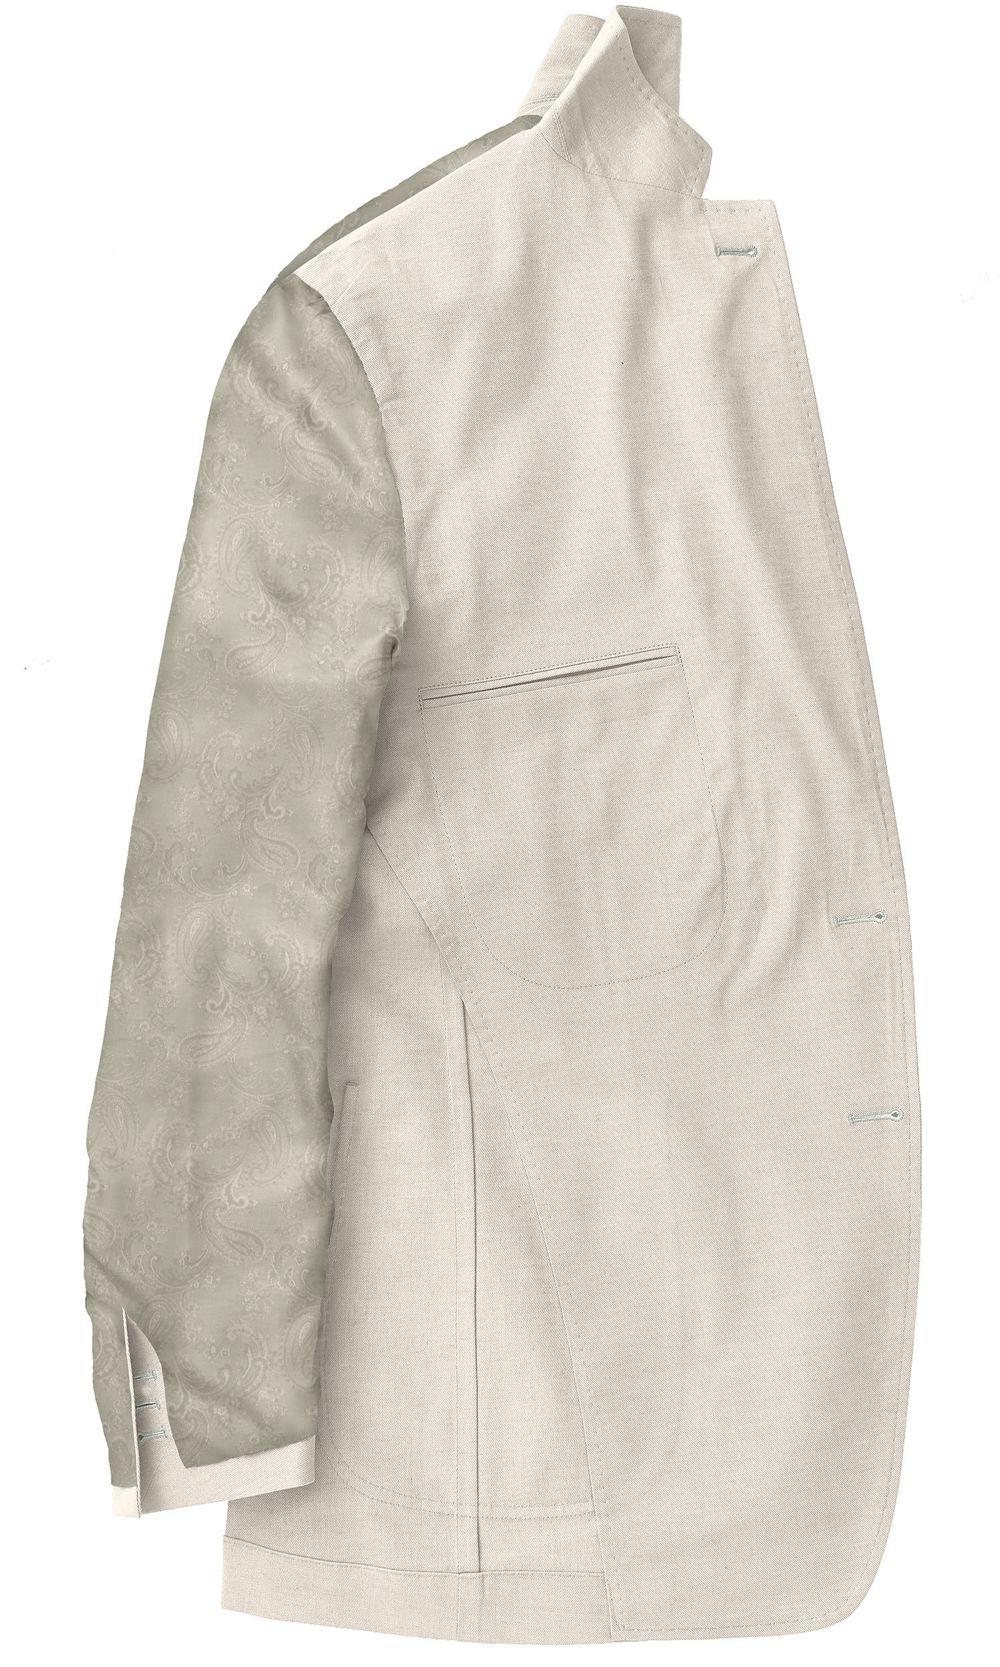 Custom made Ivory blazer with paisley lining